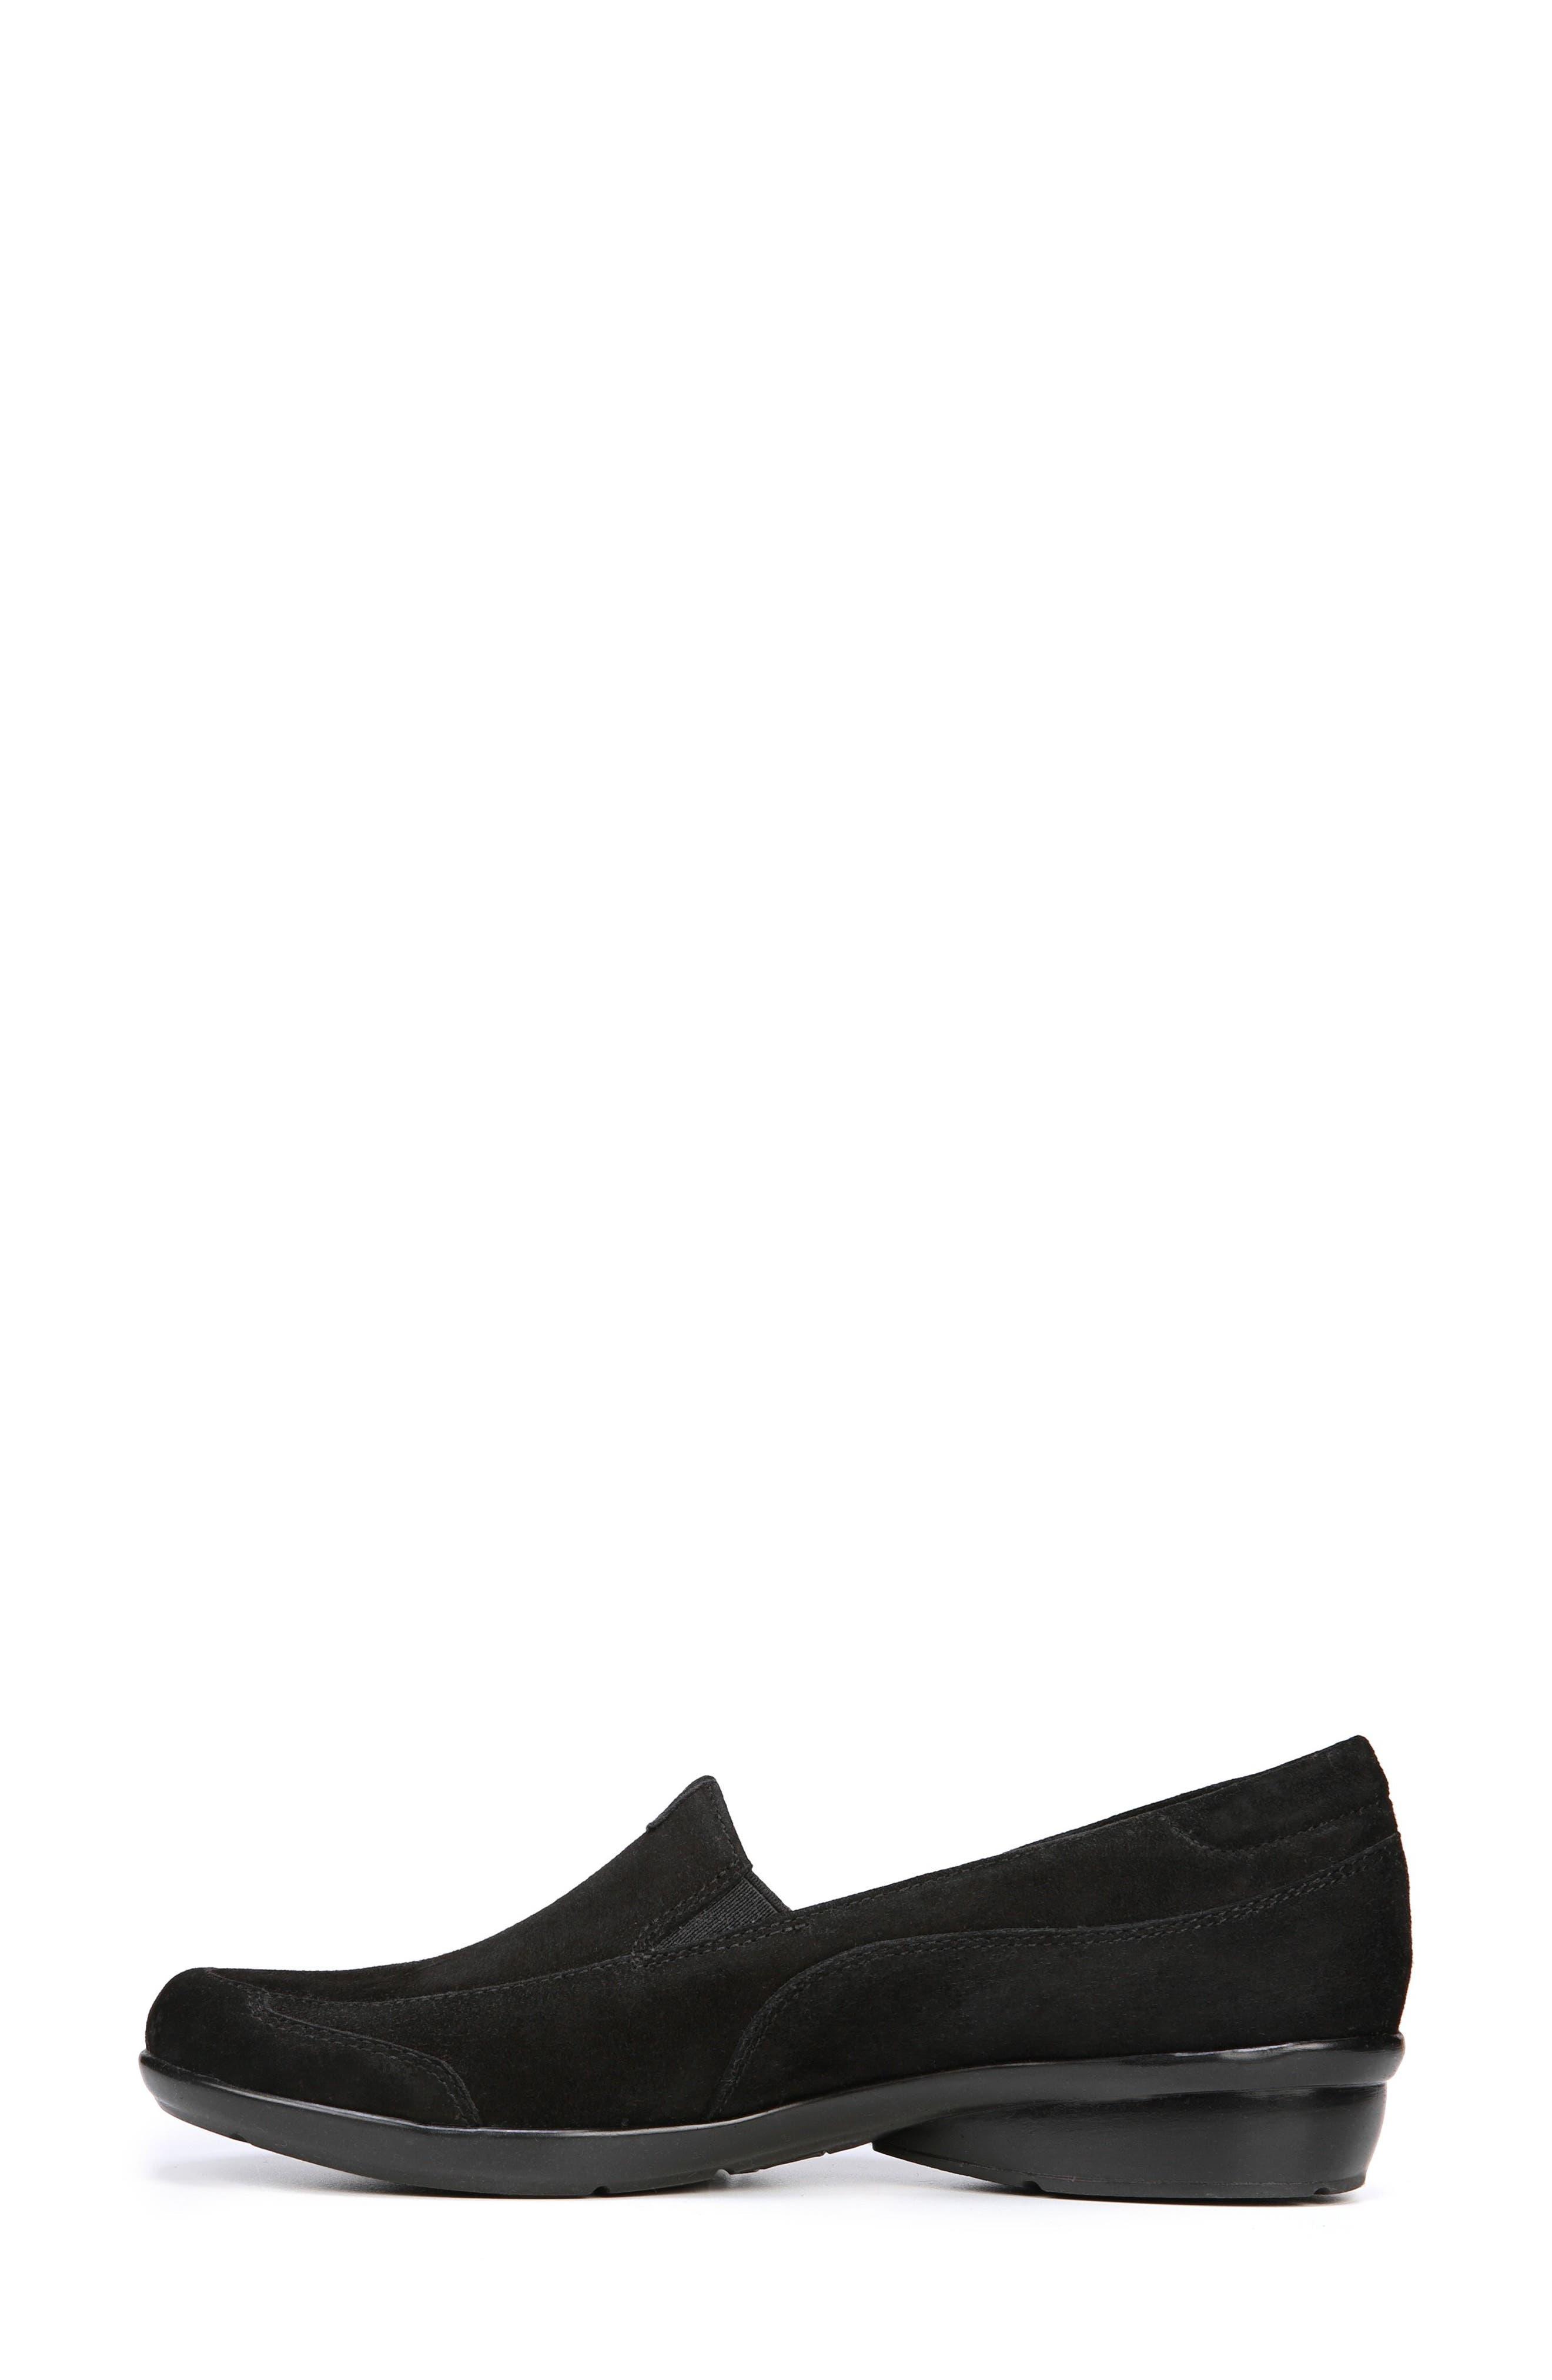 'Channing' Loafer,                             Alternate thumbnail 7, color,                             BLACK SUEDE